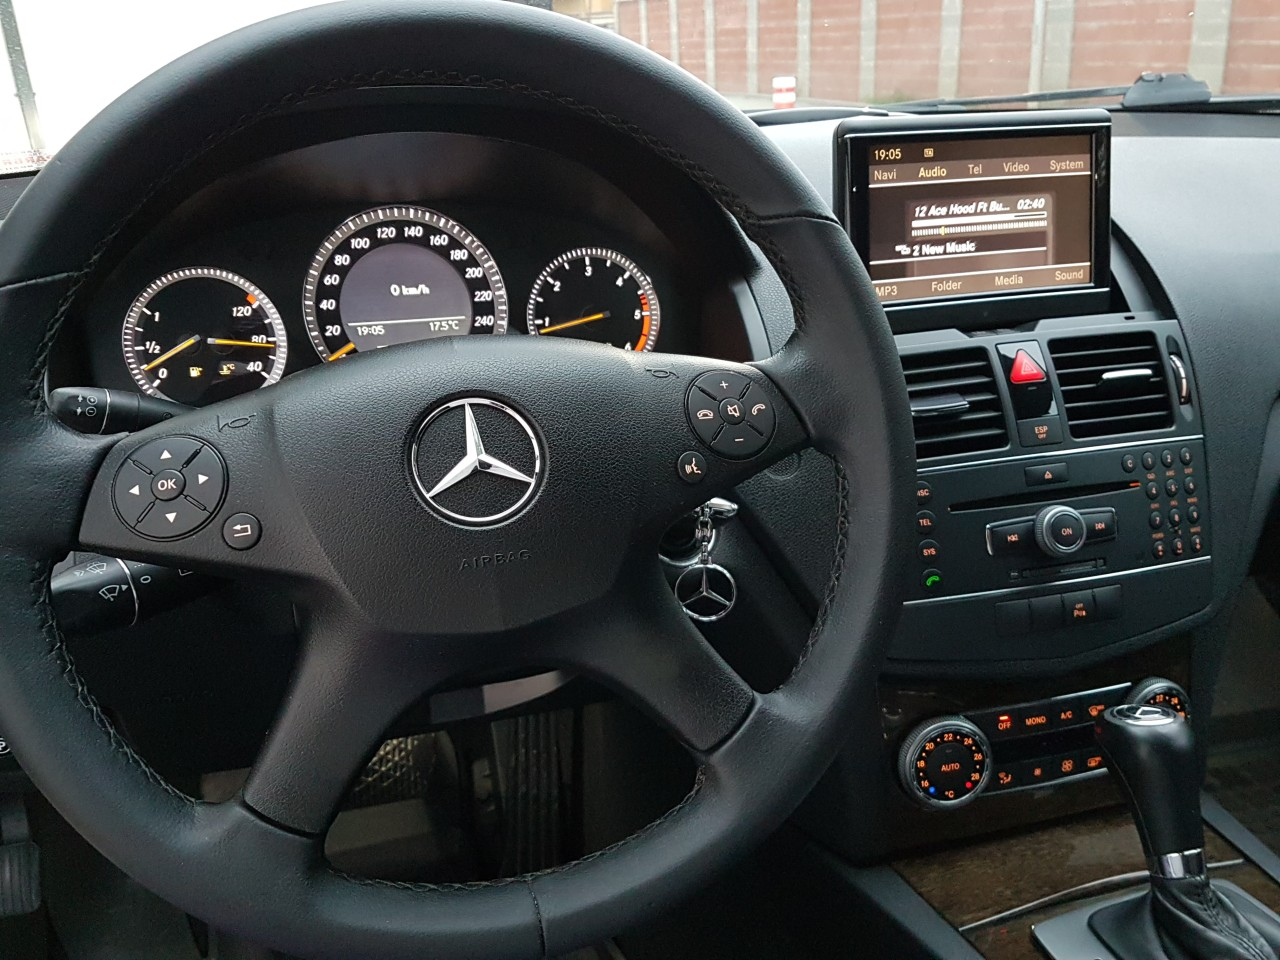 Mercedes C 220 2.2 CDI 2007